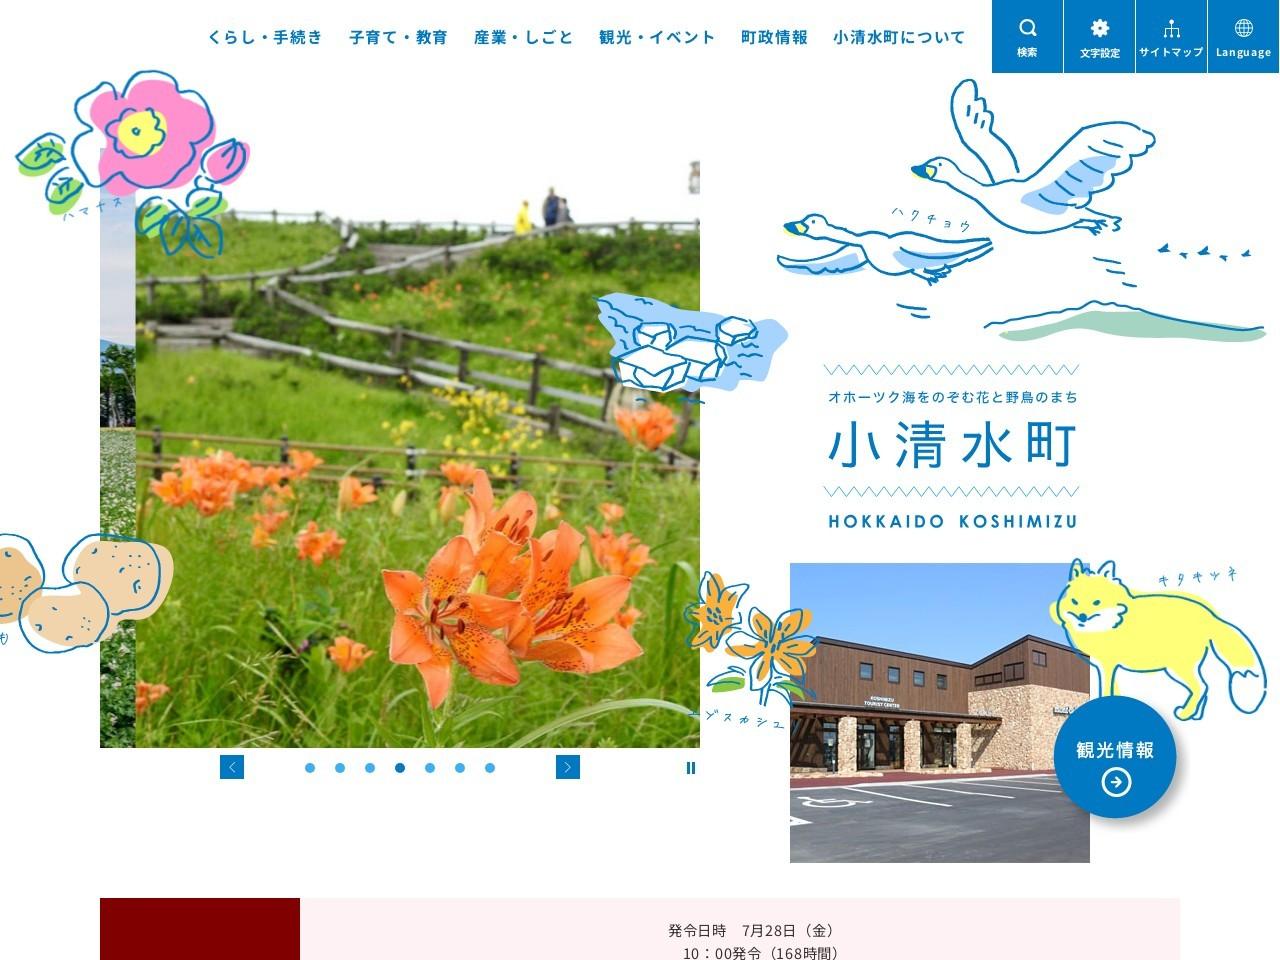 http://www.town.koshimizu.hokkaido.jp/hotnews/detail/00003055.html